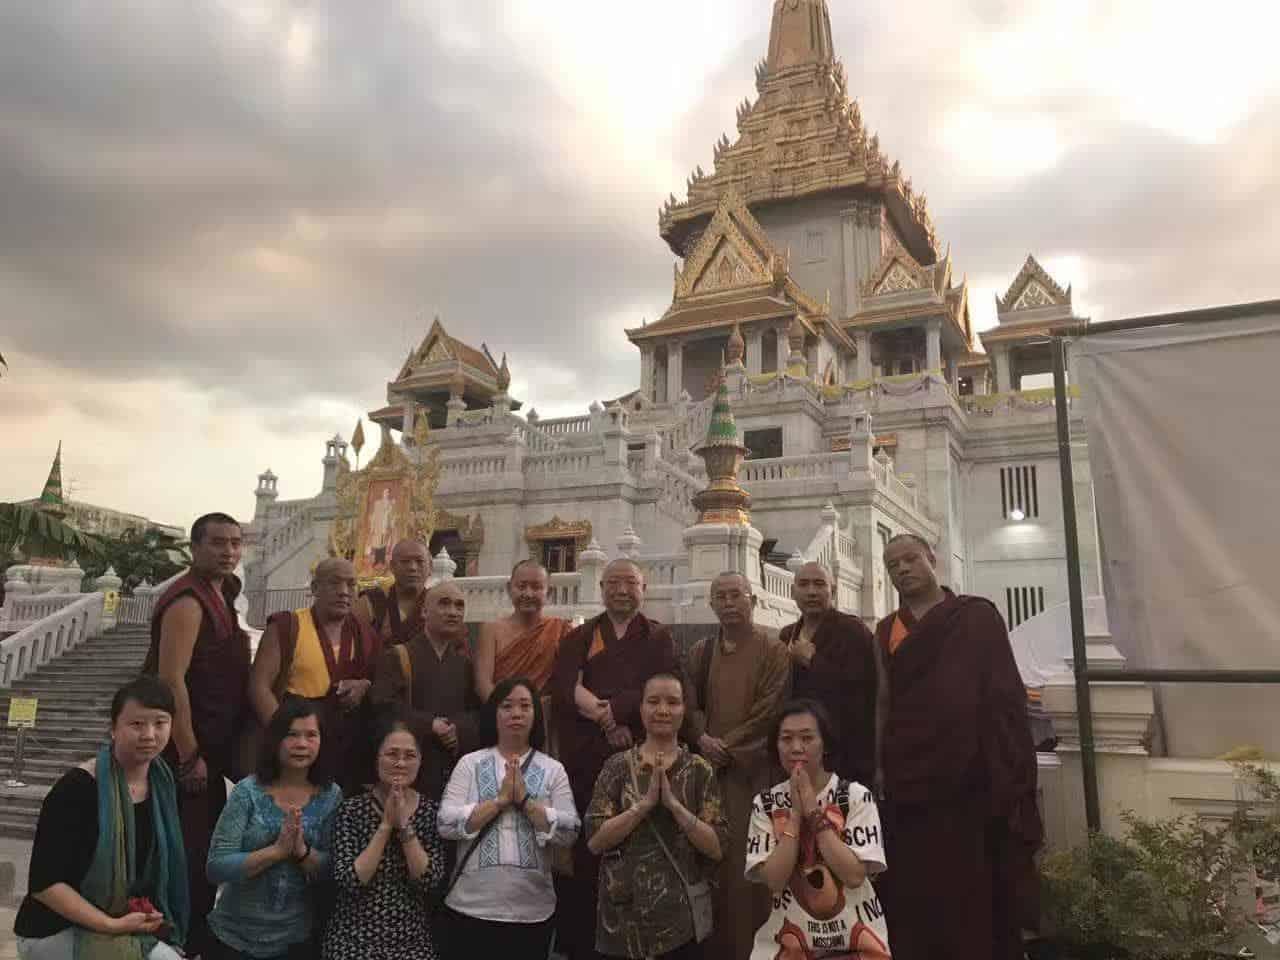 Gosok Rinpoche Thailand 2017 T013 04163a7cb2d01edc992e2713655491a